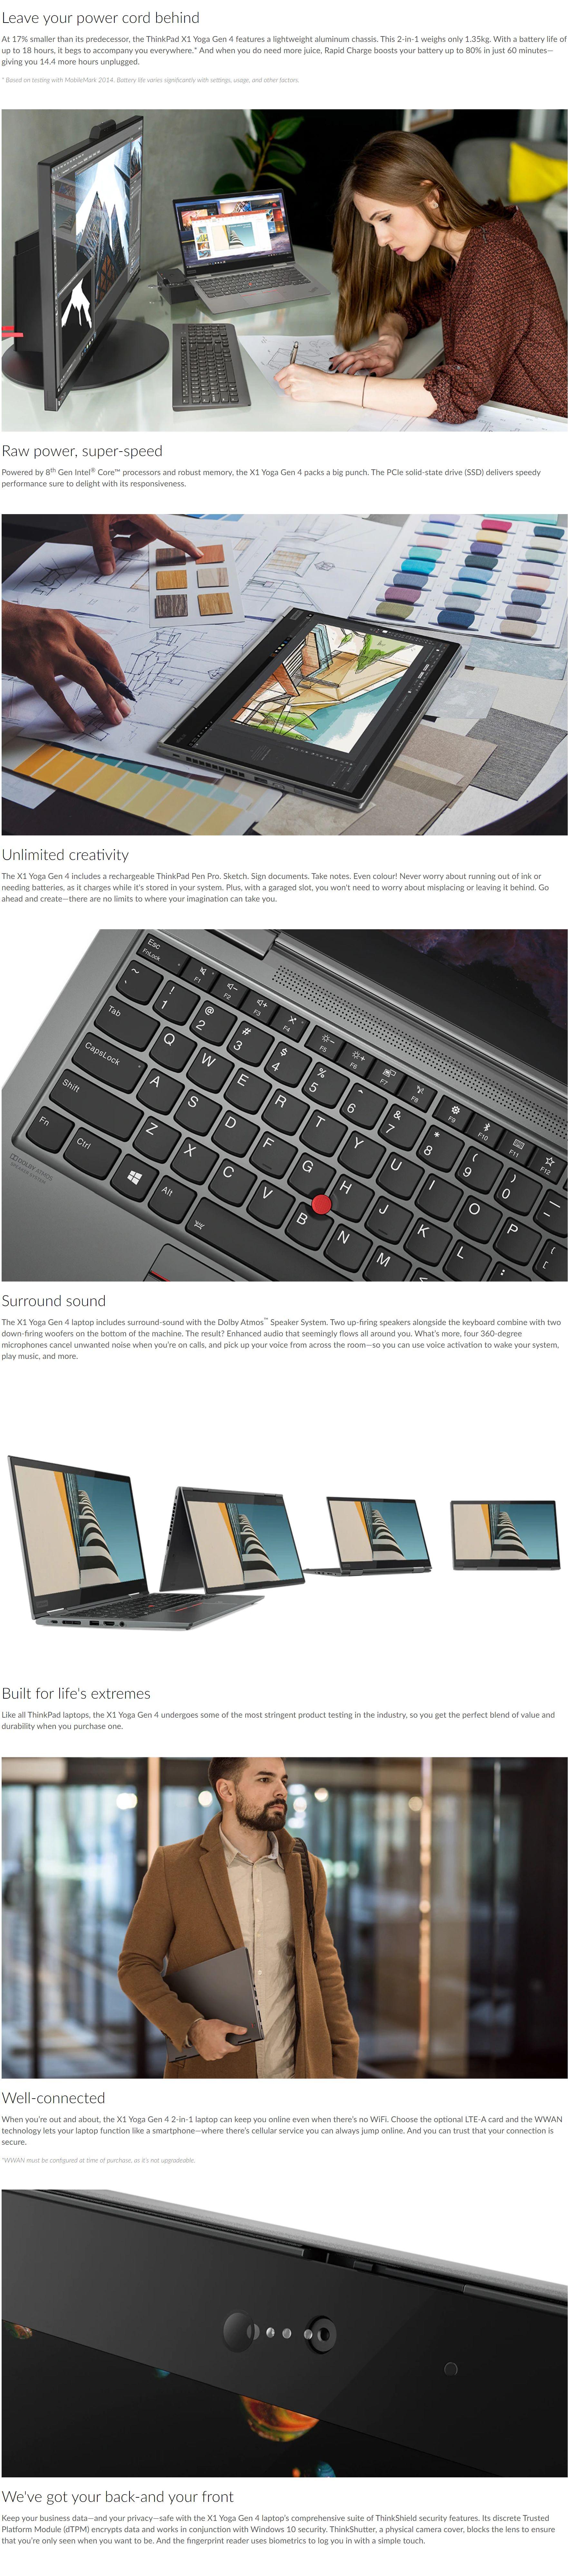 #1497 - 'ThinkPad X1 Yoga Gen 4 I Lightweight 2-in-1 Laptop I Lenovo Australia' - www_lenovo_com.jpg